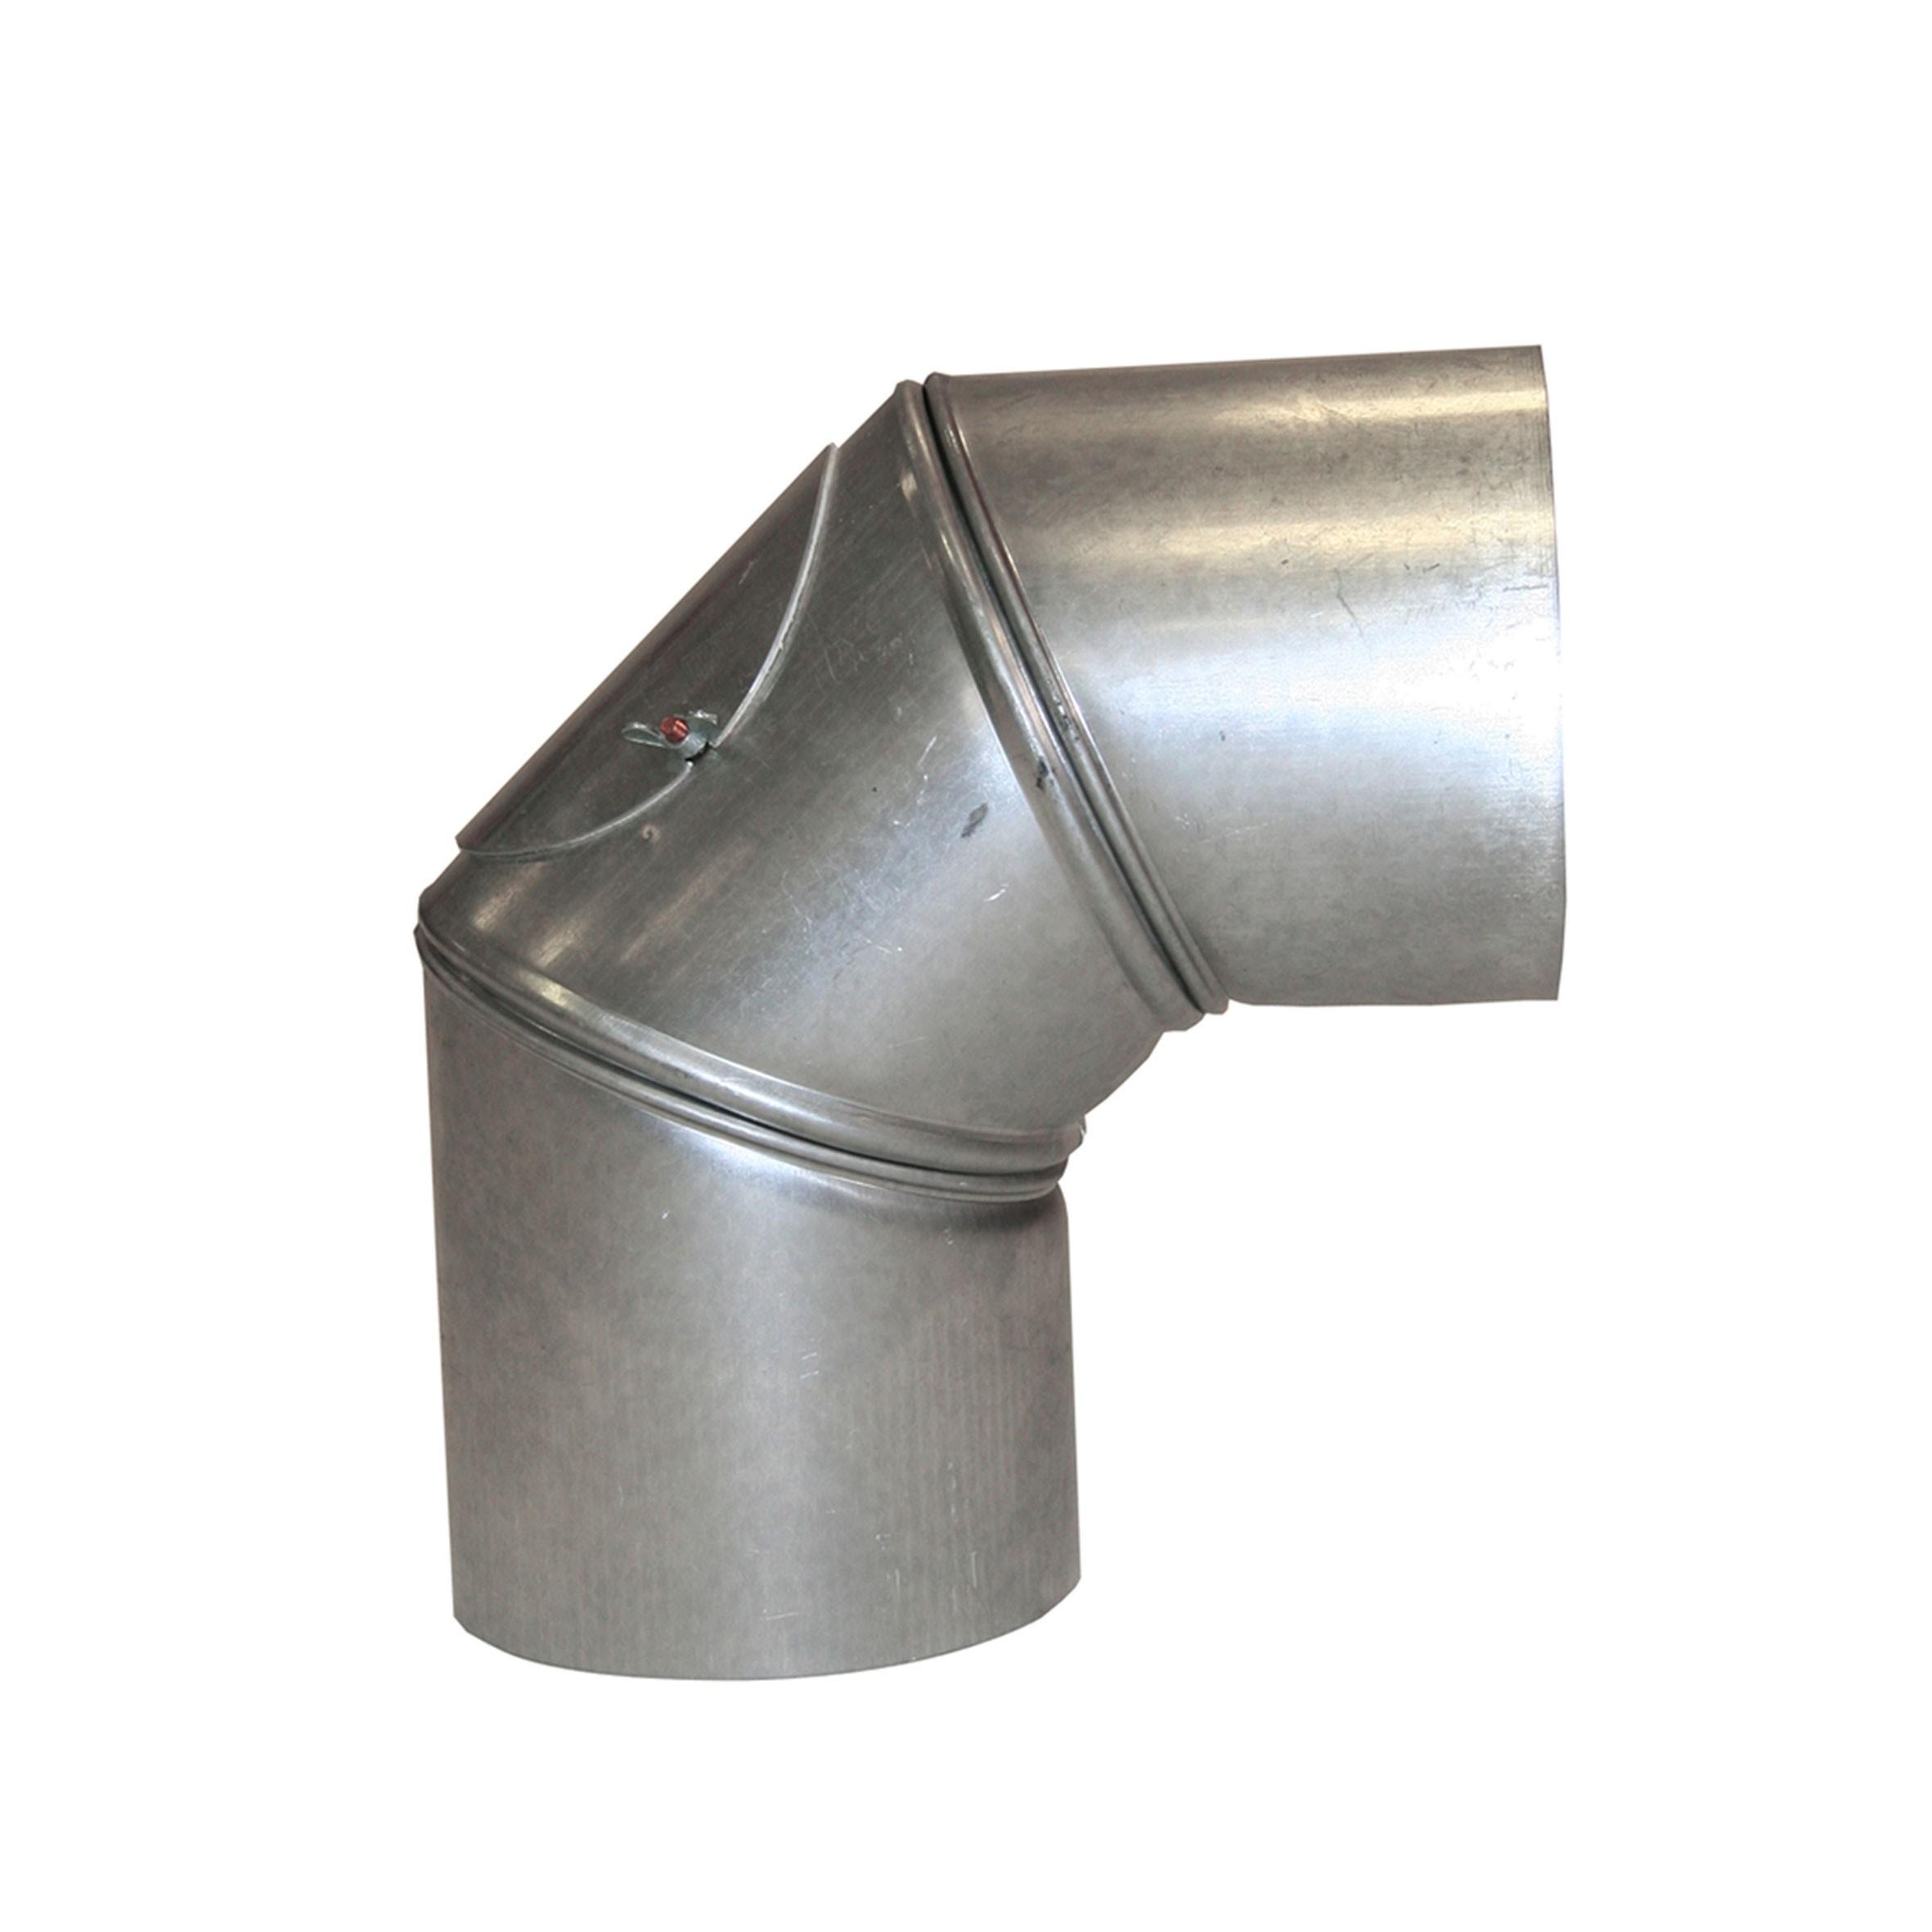 Ofenrohr / Rauchrohr KaminoFlam FAL Bogeknie 90° Ø120mm 3tlg. mit Tür Bild 1